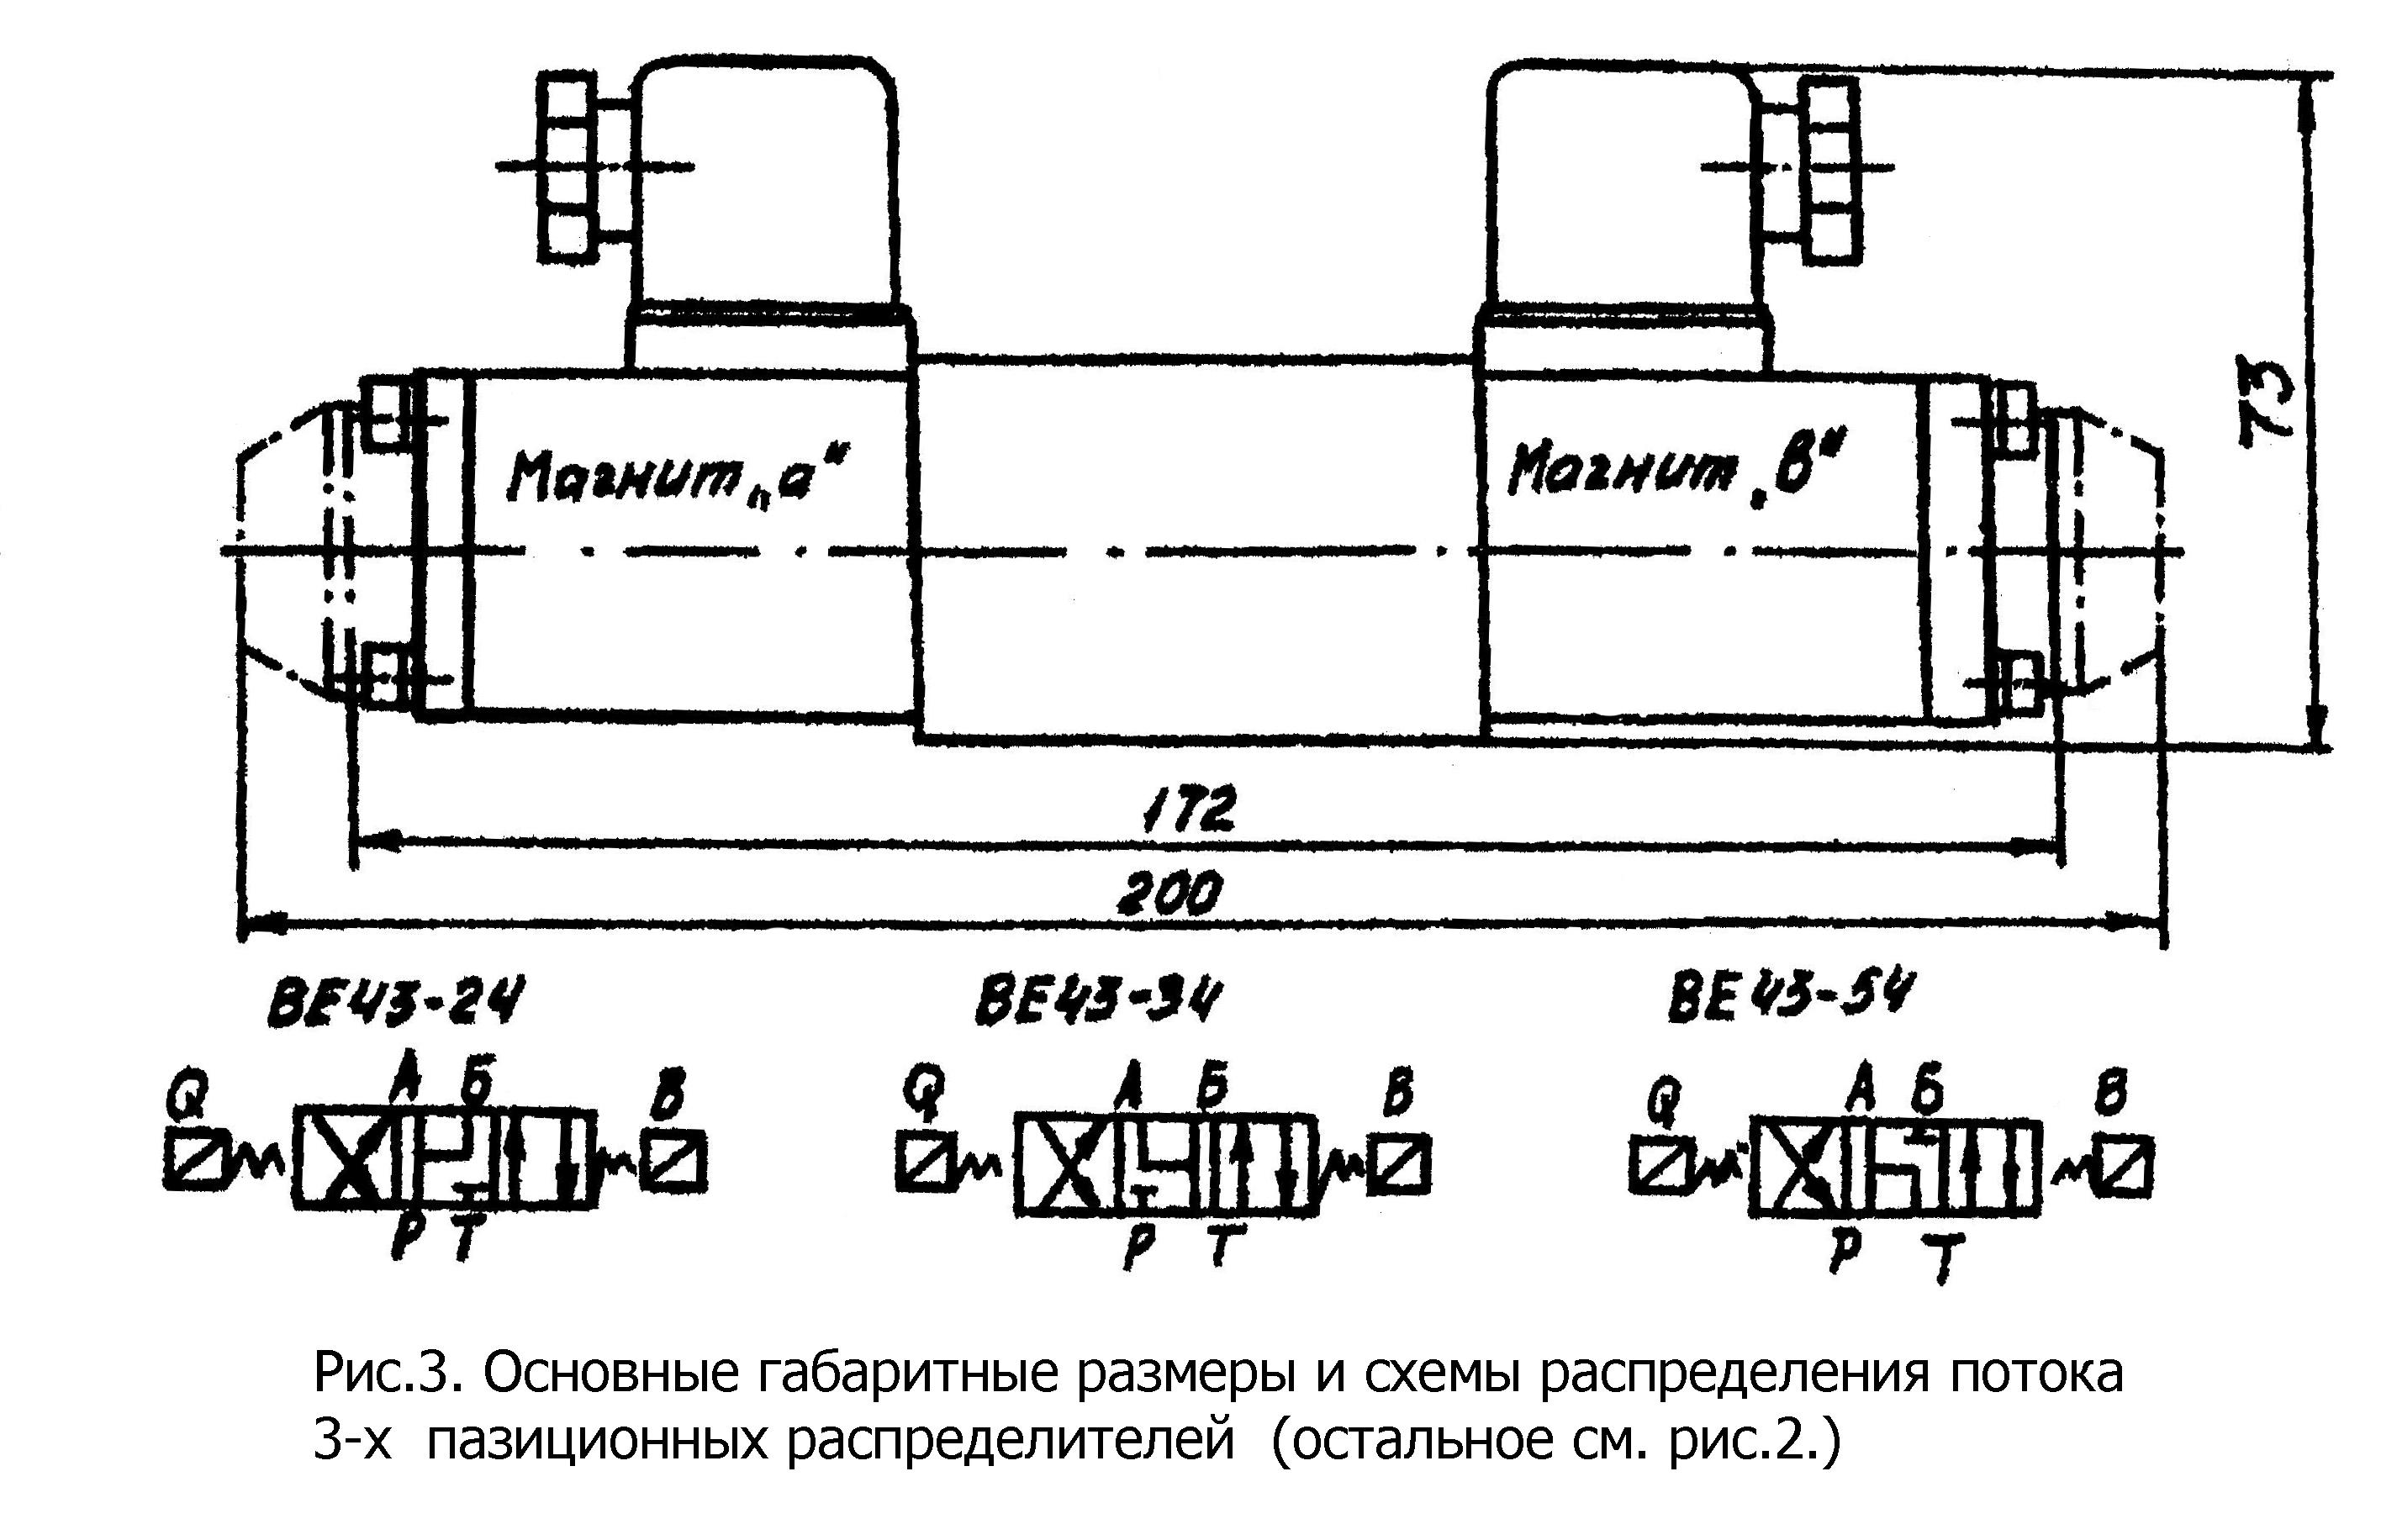 Гидрораспределители ВЕ43 24, ВЕ43 34, ВЕ43 54